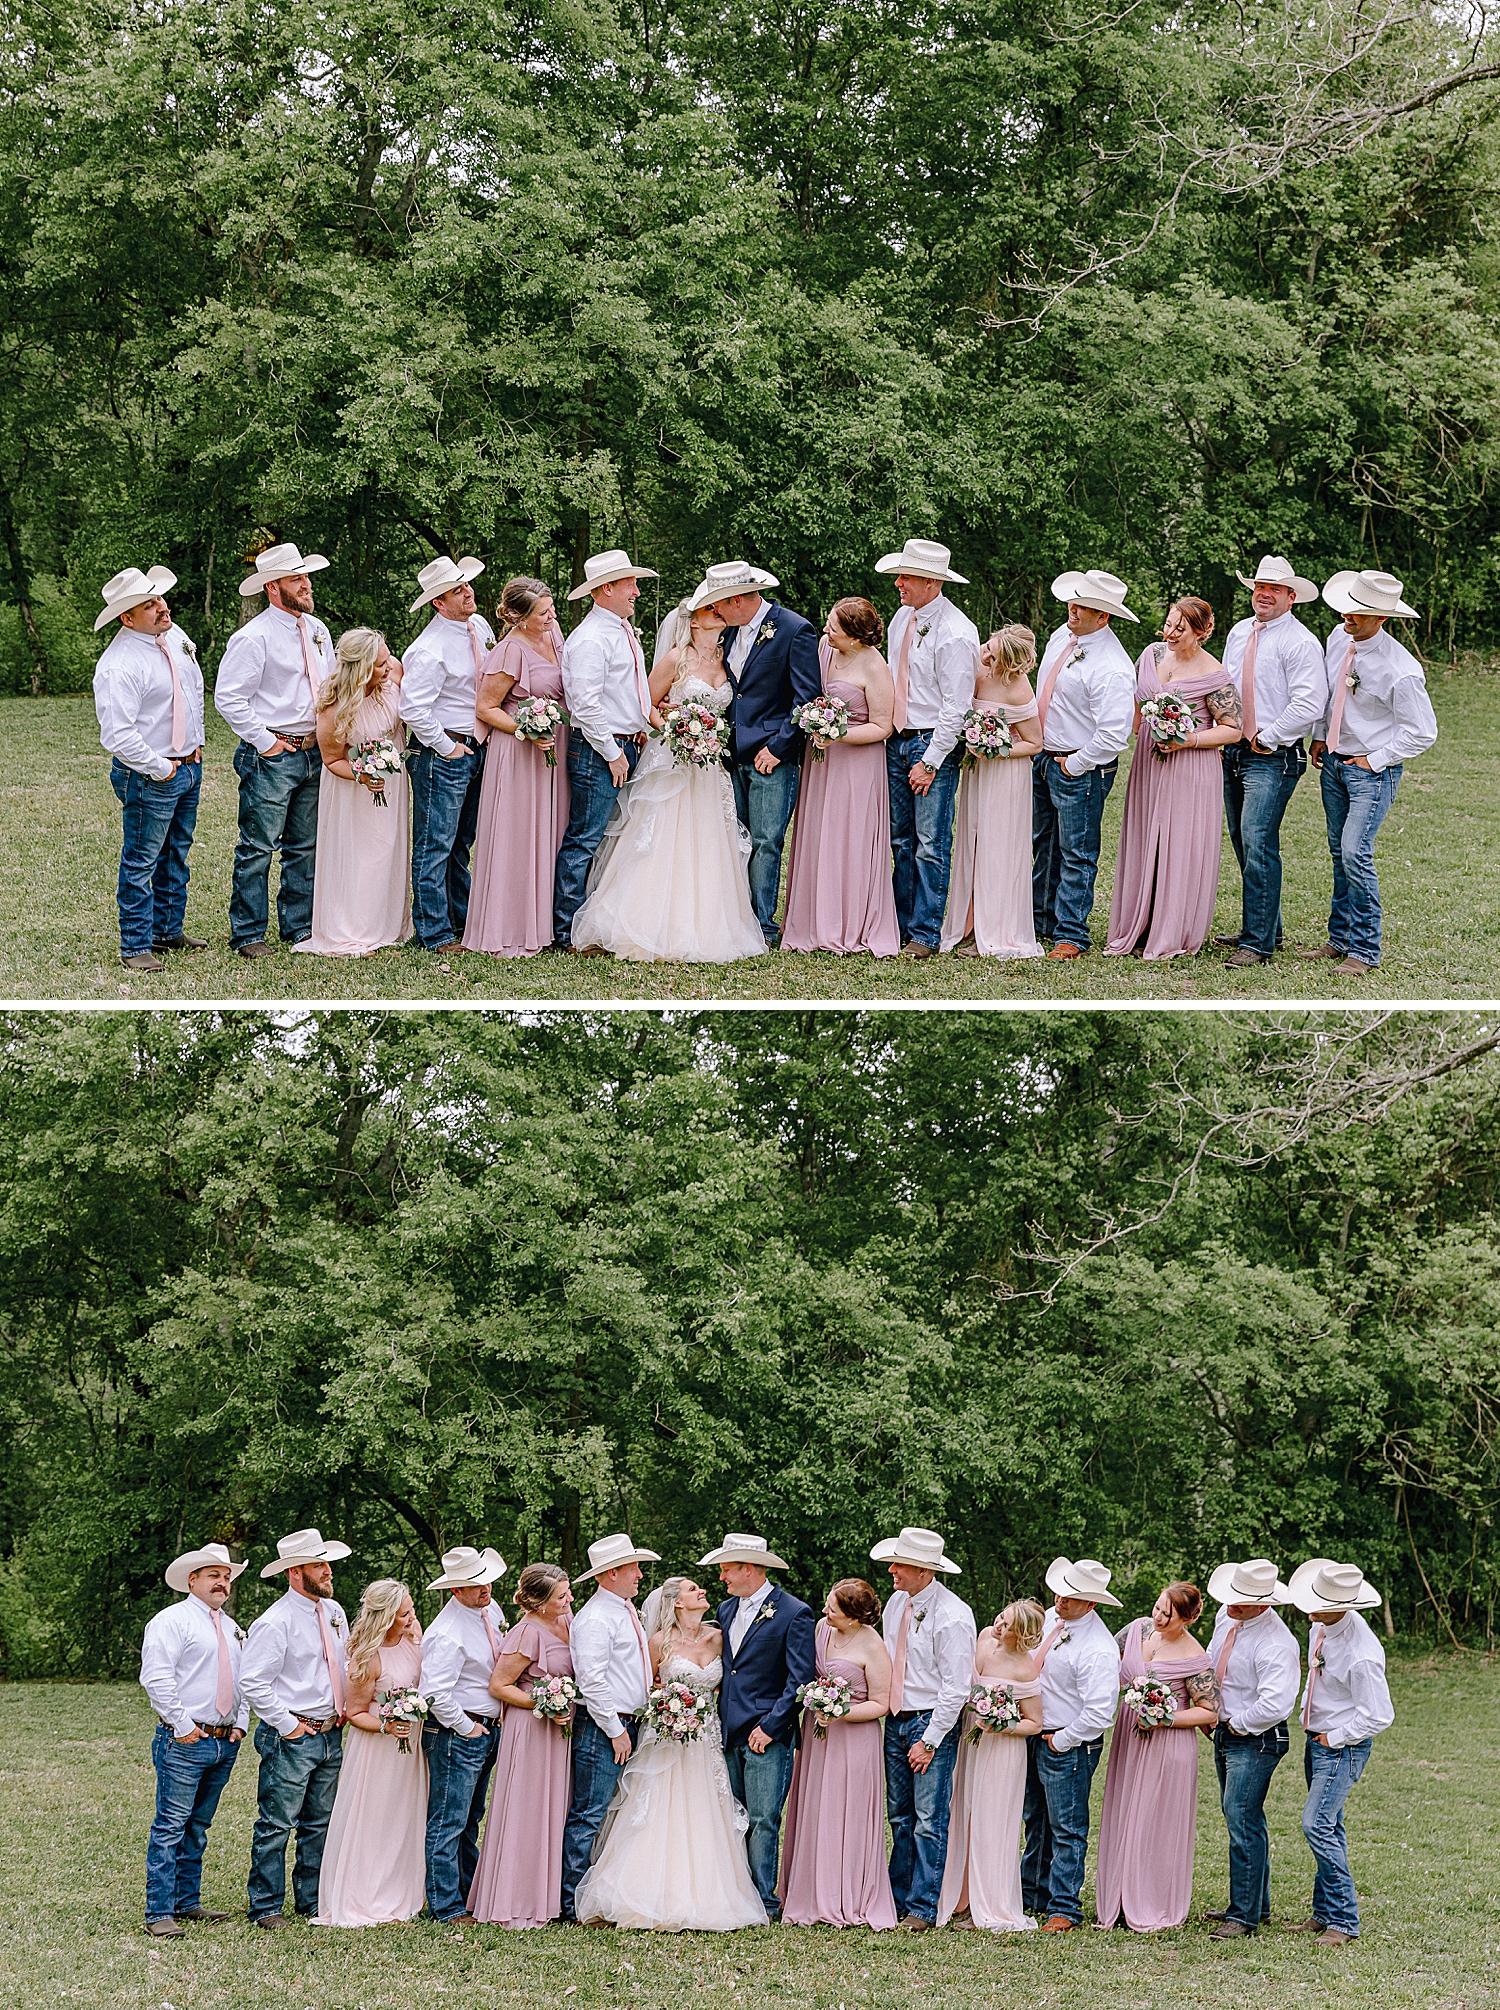 Rio-Cibilo-Ranch-Marion-Texas-Wedding-Rustic-Blush-Rose-Quartz-Details-Carly-Barton-Photography_0050.jpg